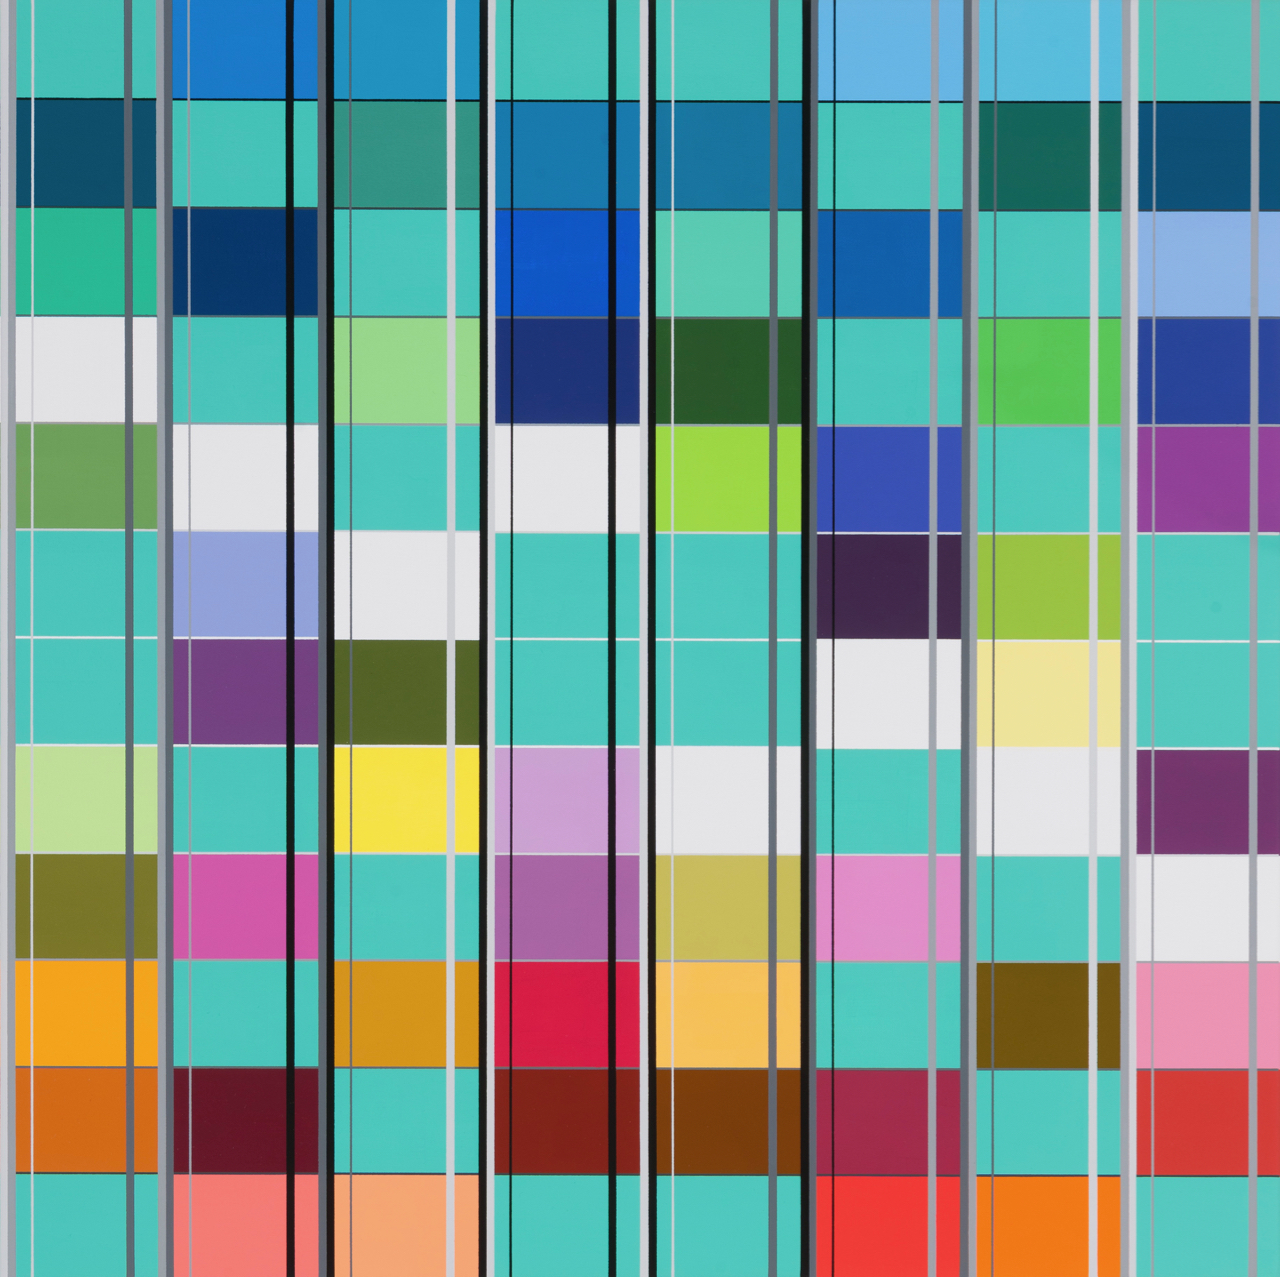 Untitled, 406, 60 x 60 cm, 2014